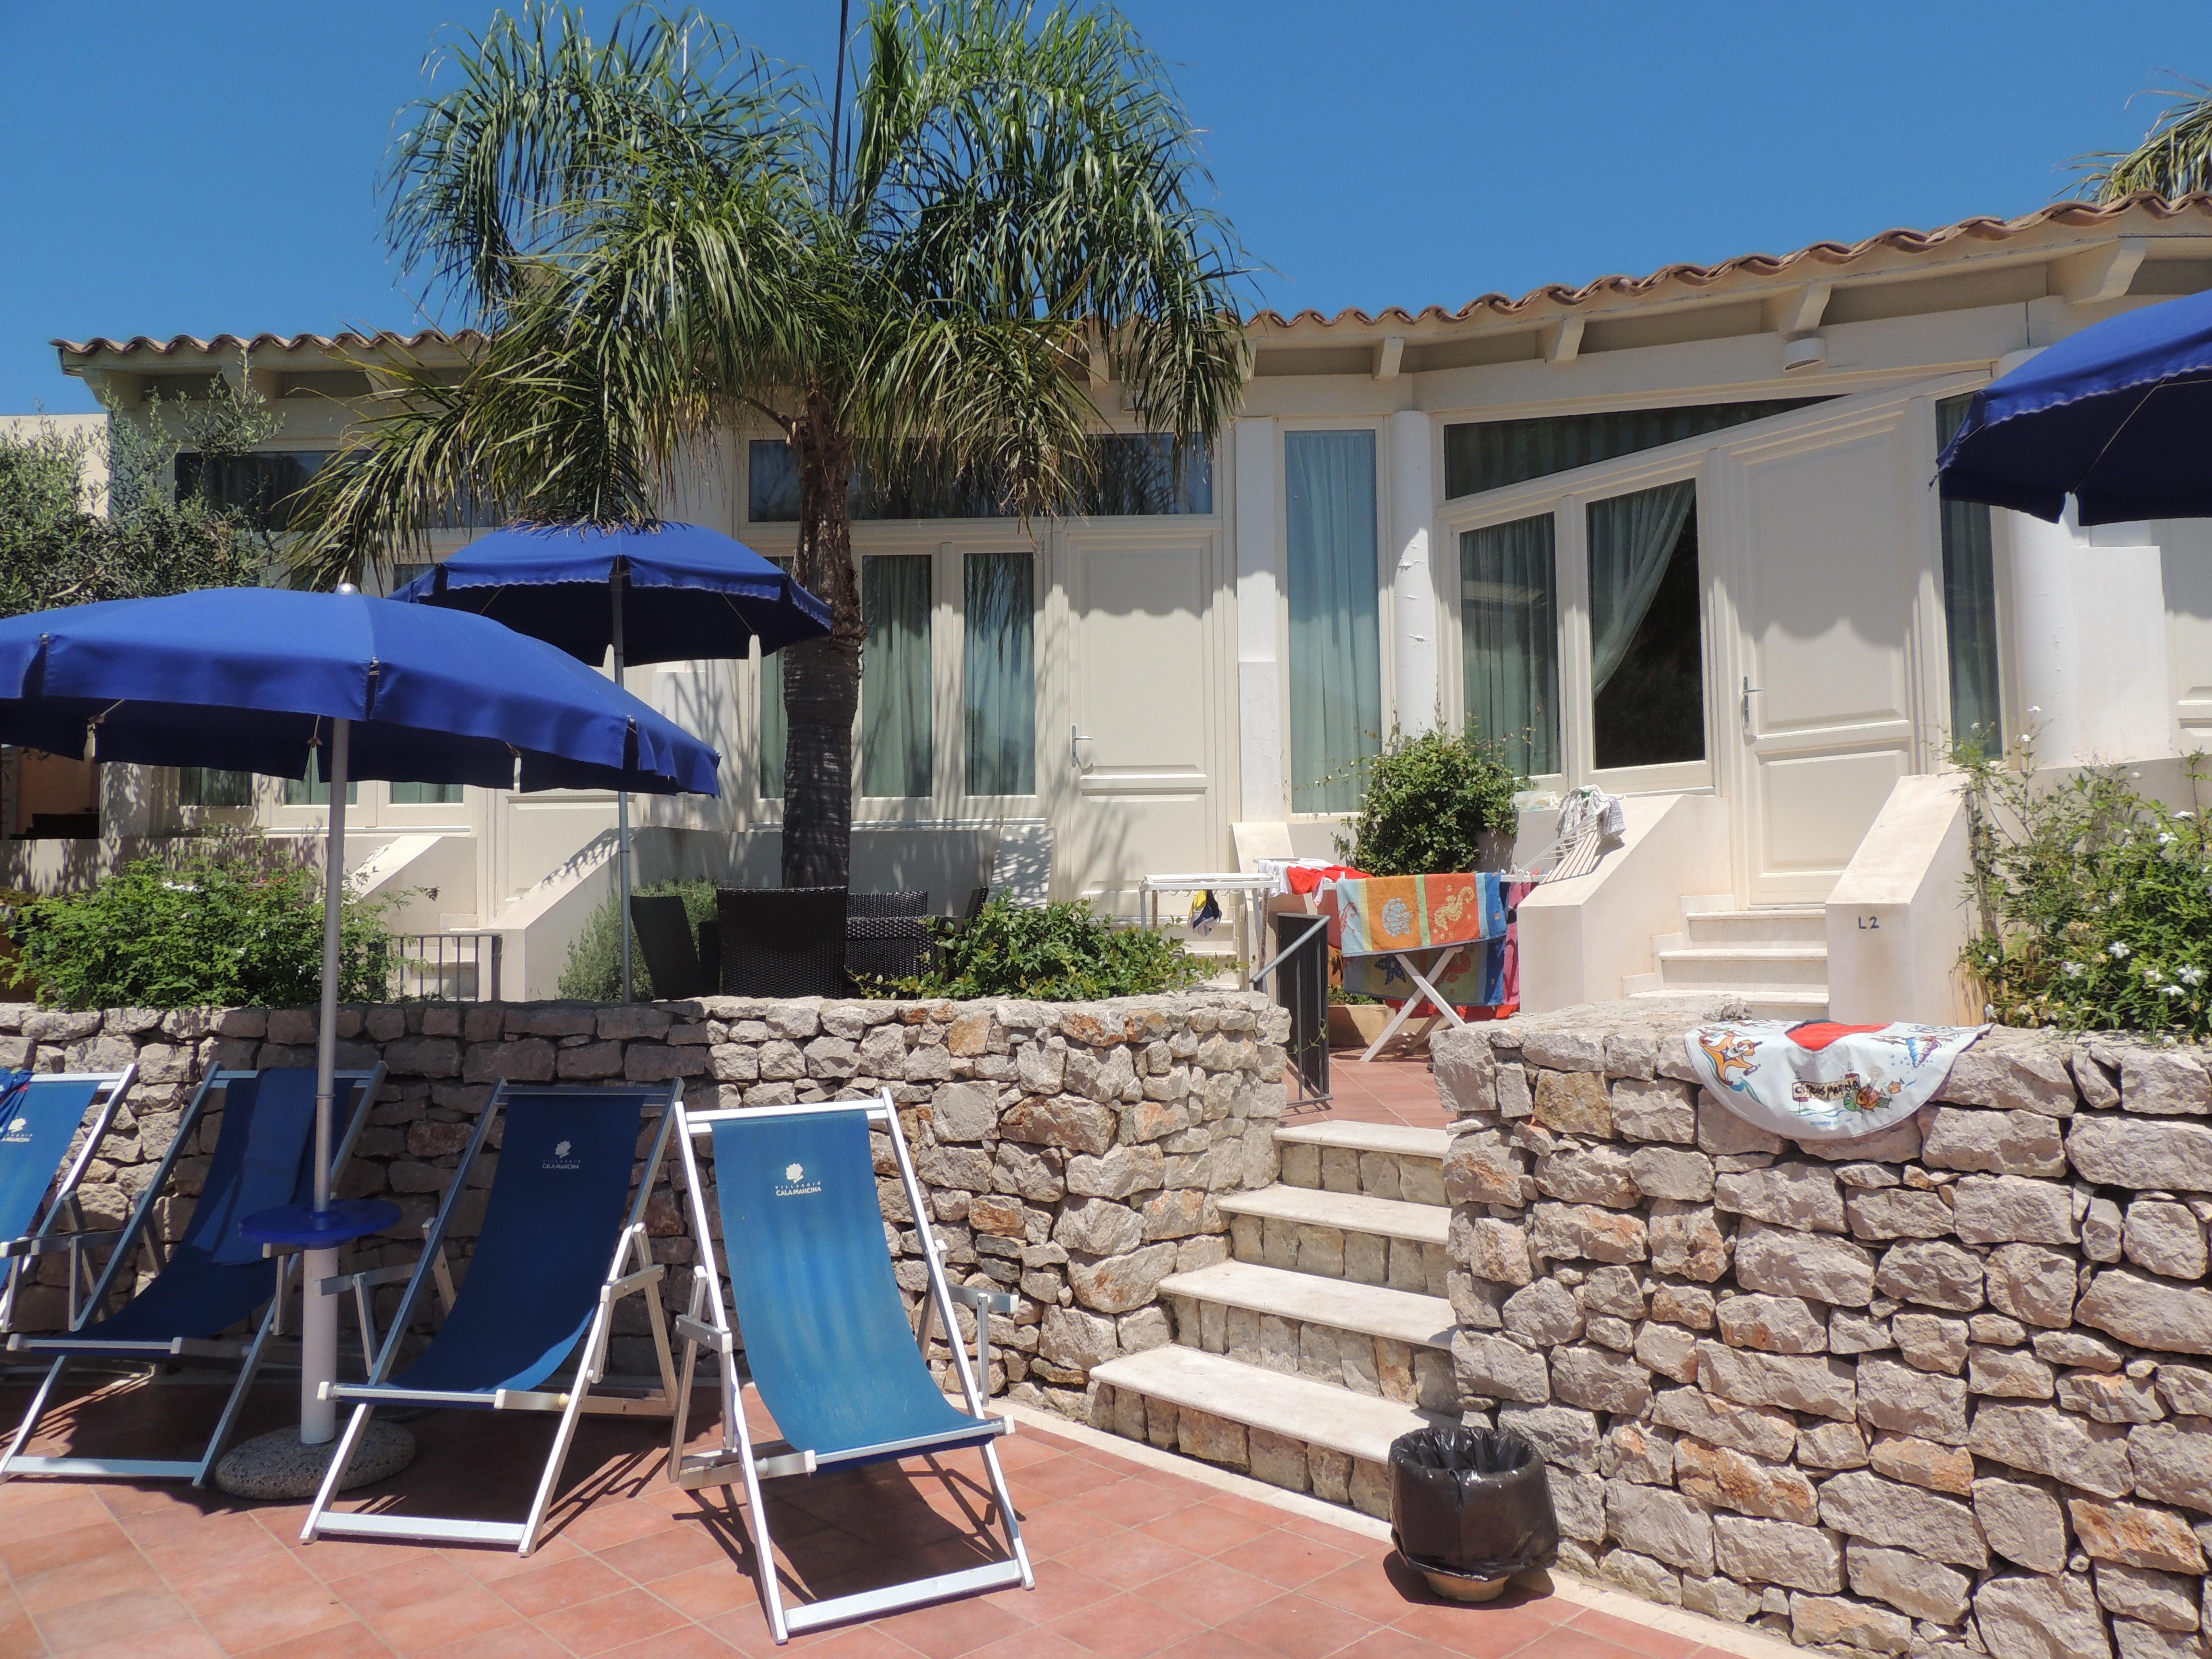 Holiday house San Vito Lo Capo - Dorf Calamancina - 5-Zimmer-Wohnung (2420963), San Vito Lo Capo, Trapani, Sicily, Italy, picture 3